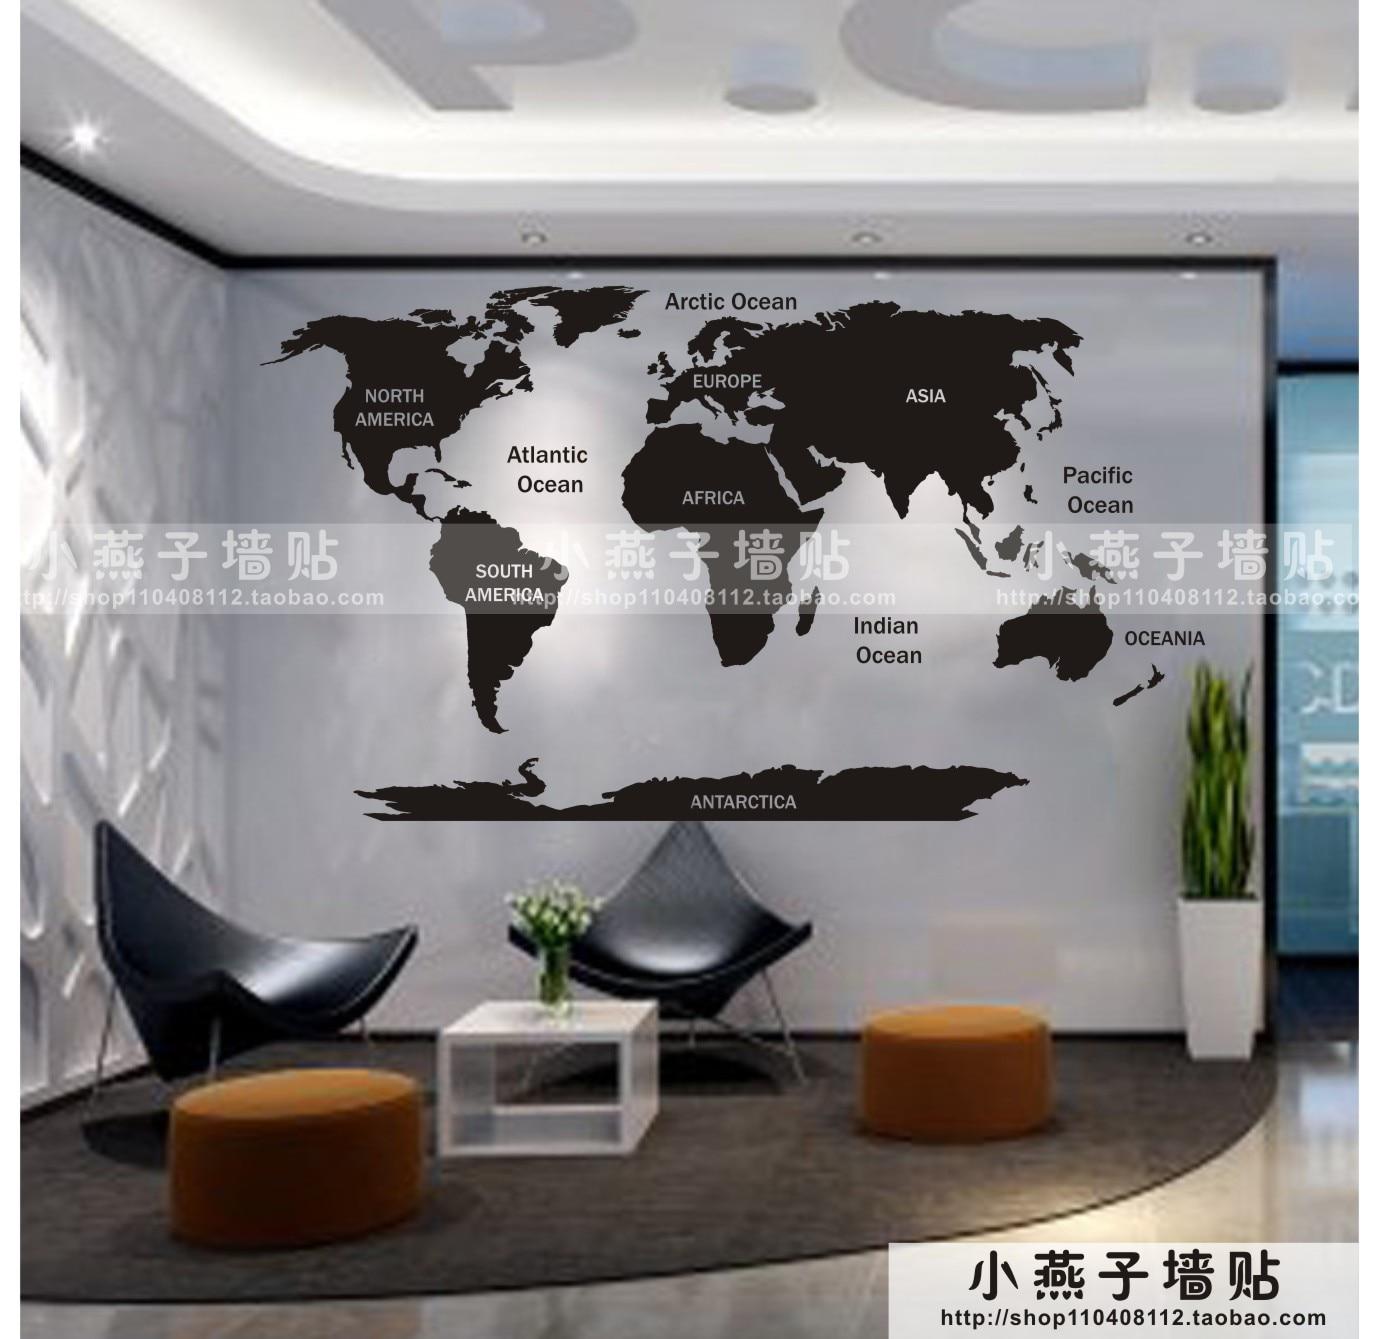 <font><b>New</b></font> Arrival Map Of World Vinyl <font><b>Wall</b></font> Decal World Map Skyline Building Art <font><b>Wall</b></font> Sticker <font><b>Office</b></font> <font><b>Living</b></font> <font><b>Room</b></font> <font><b>Bedroom</b></font> Home Decoration